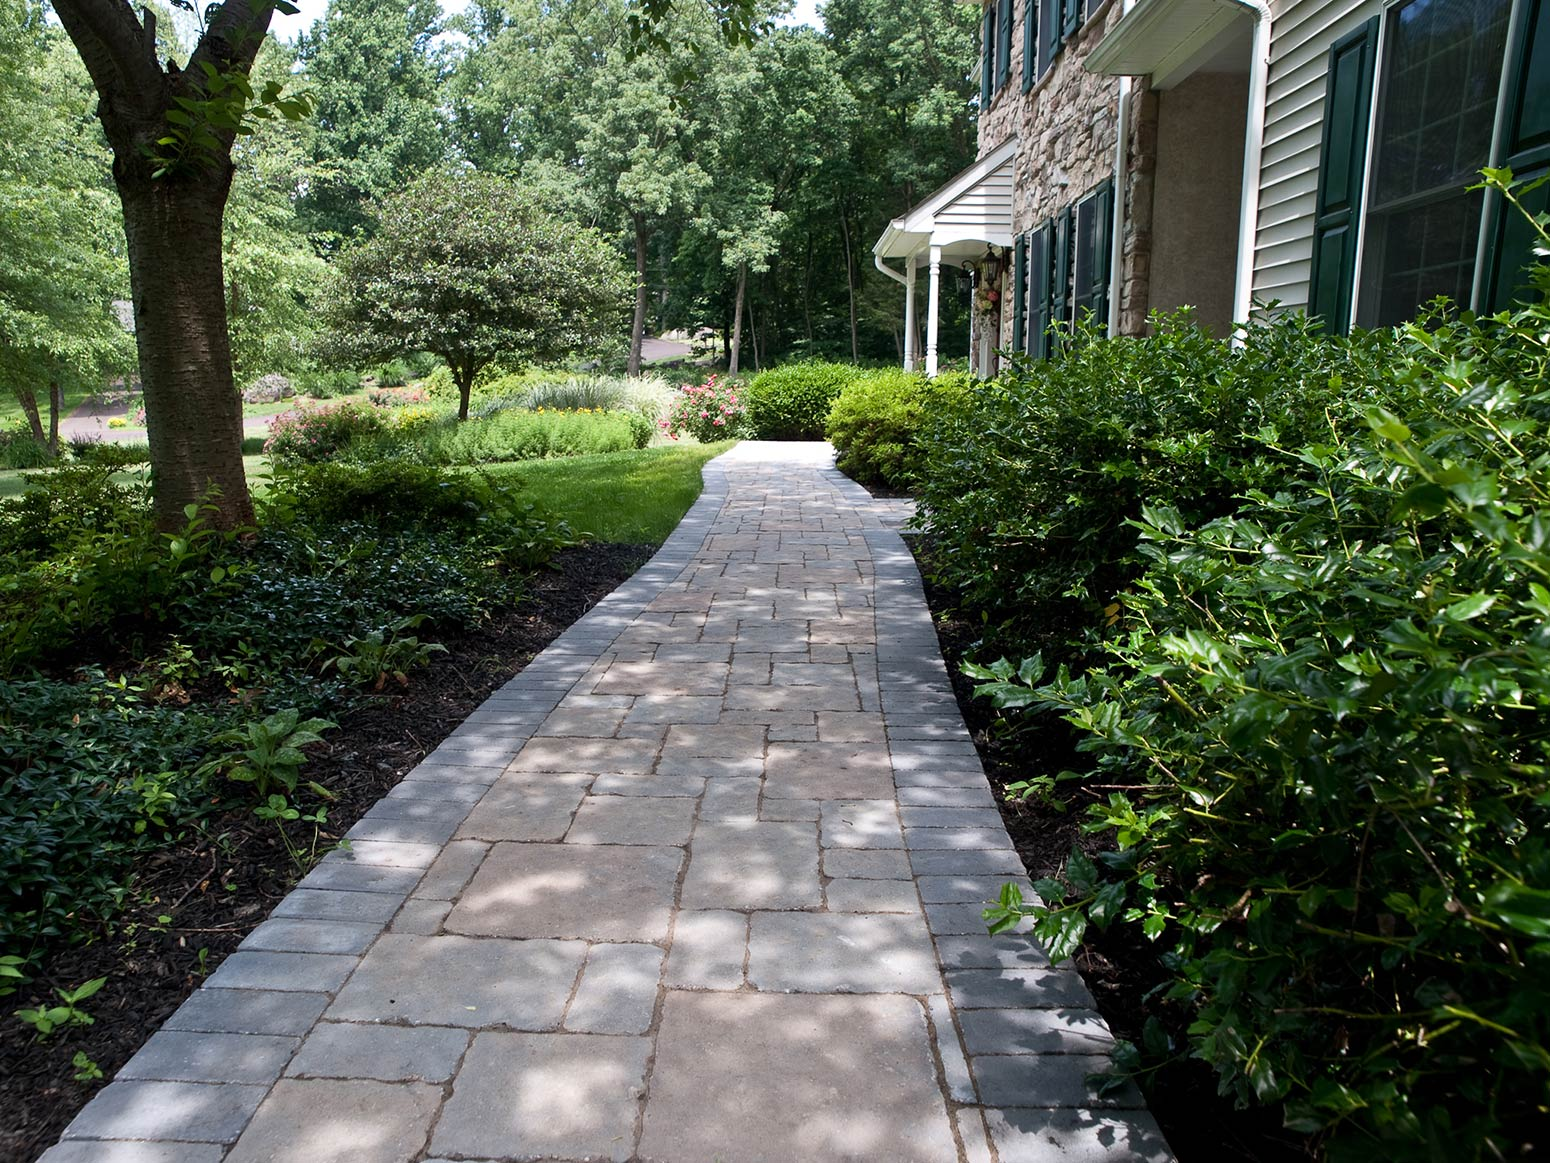 Natural stone ep henry paver walkways brick patio designs paver installation doylestown for Natural stone walkways